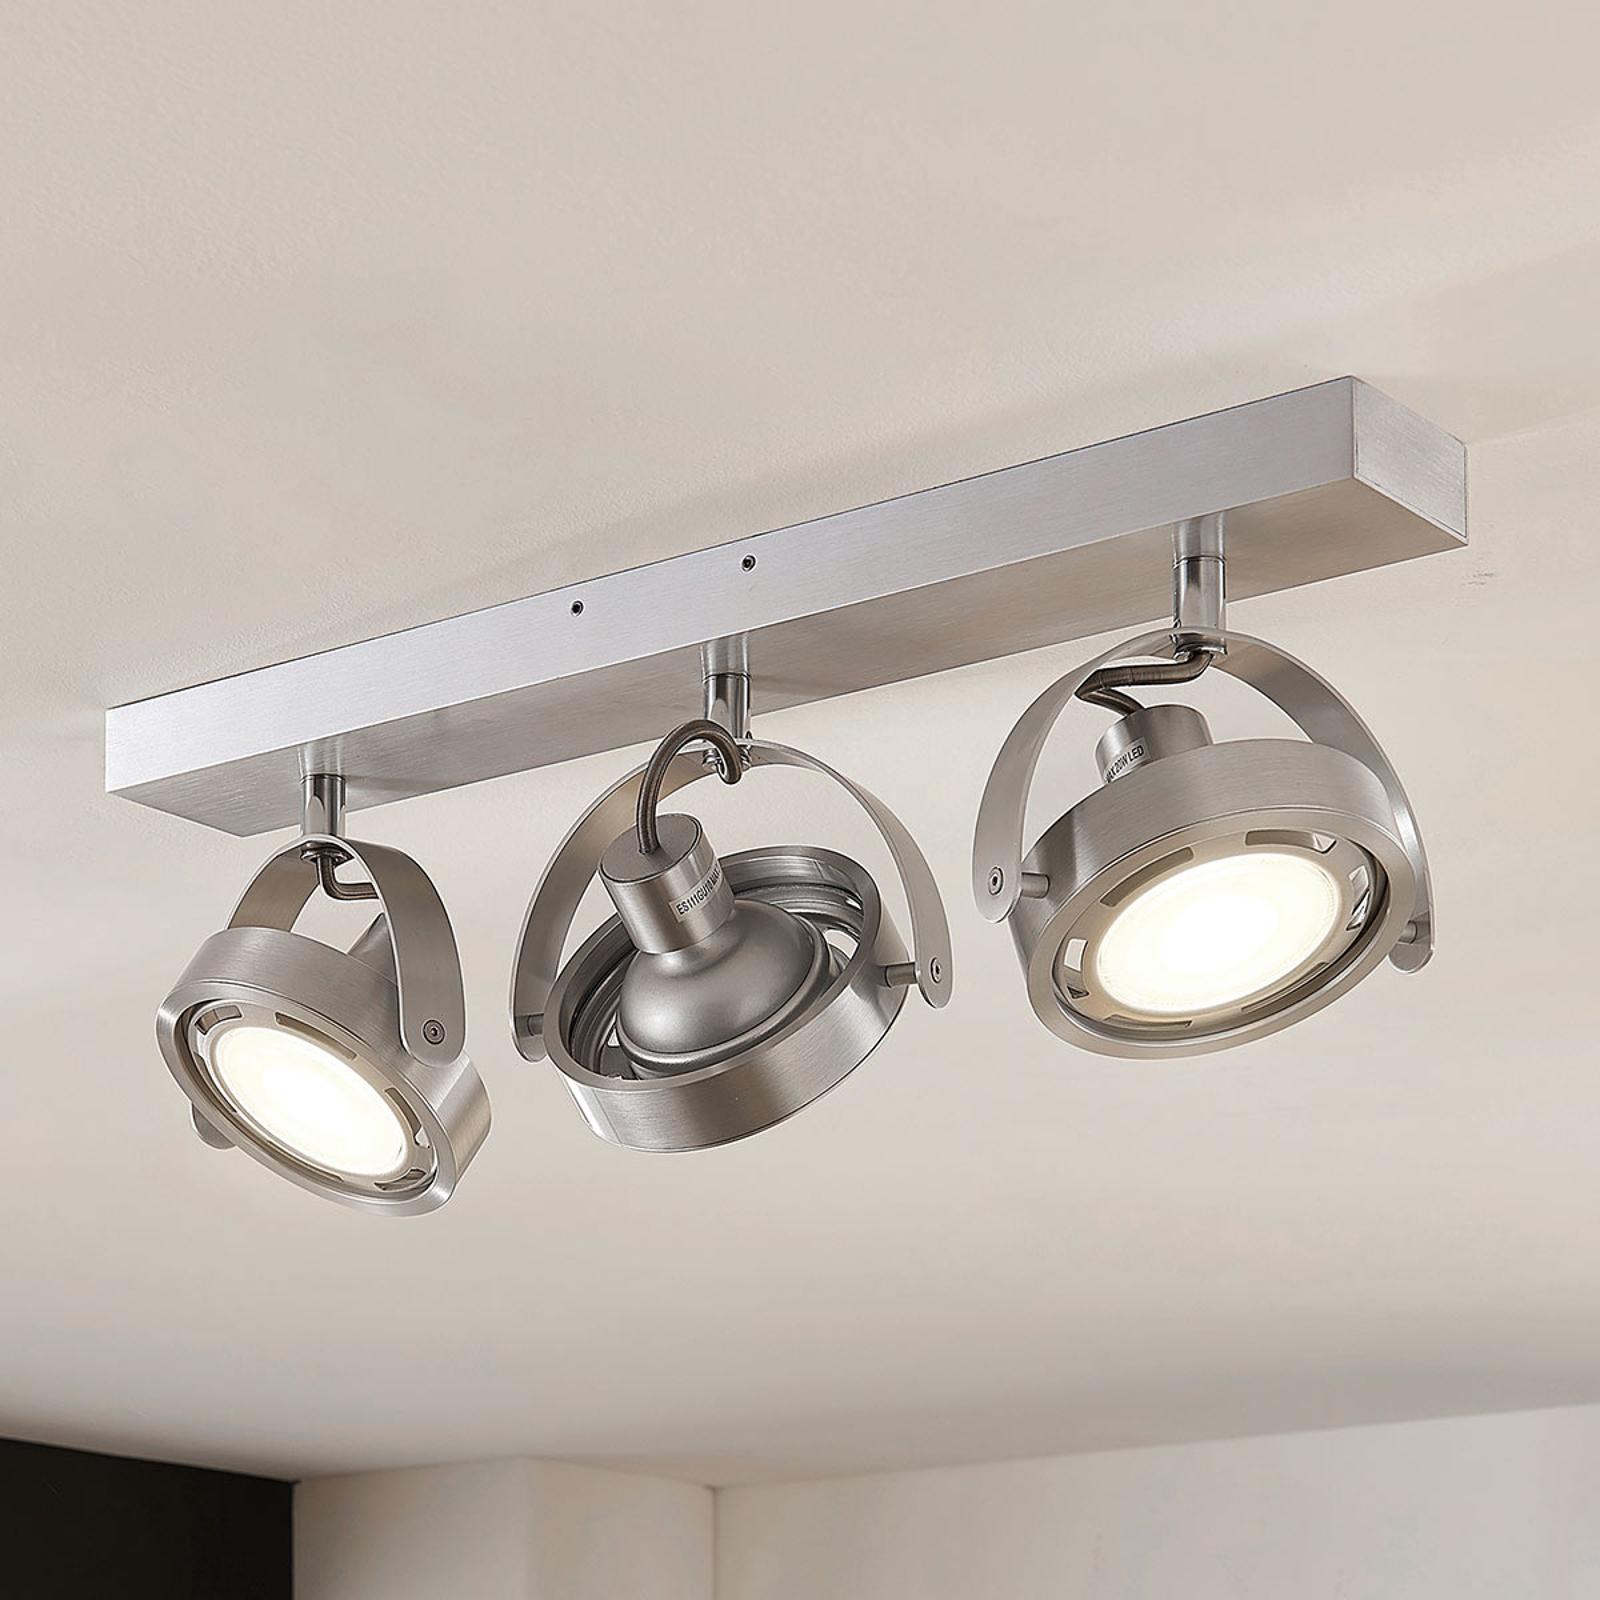 LED-Strahler Munin, dimmbar, alu, 3-flammig